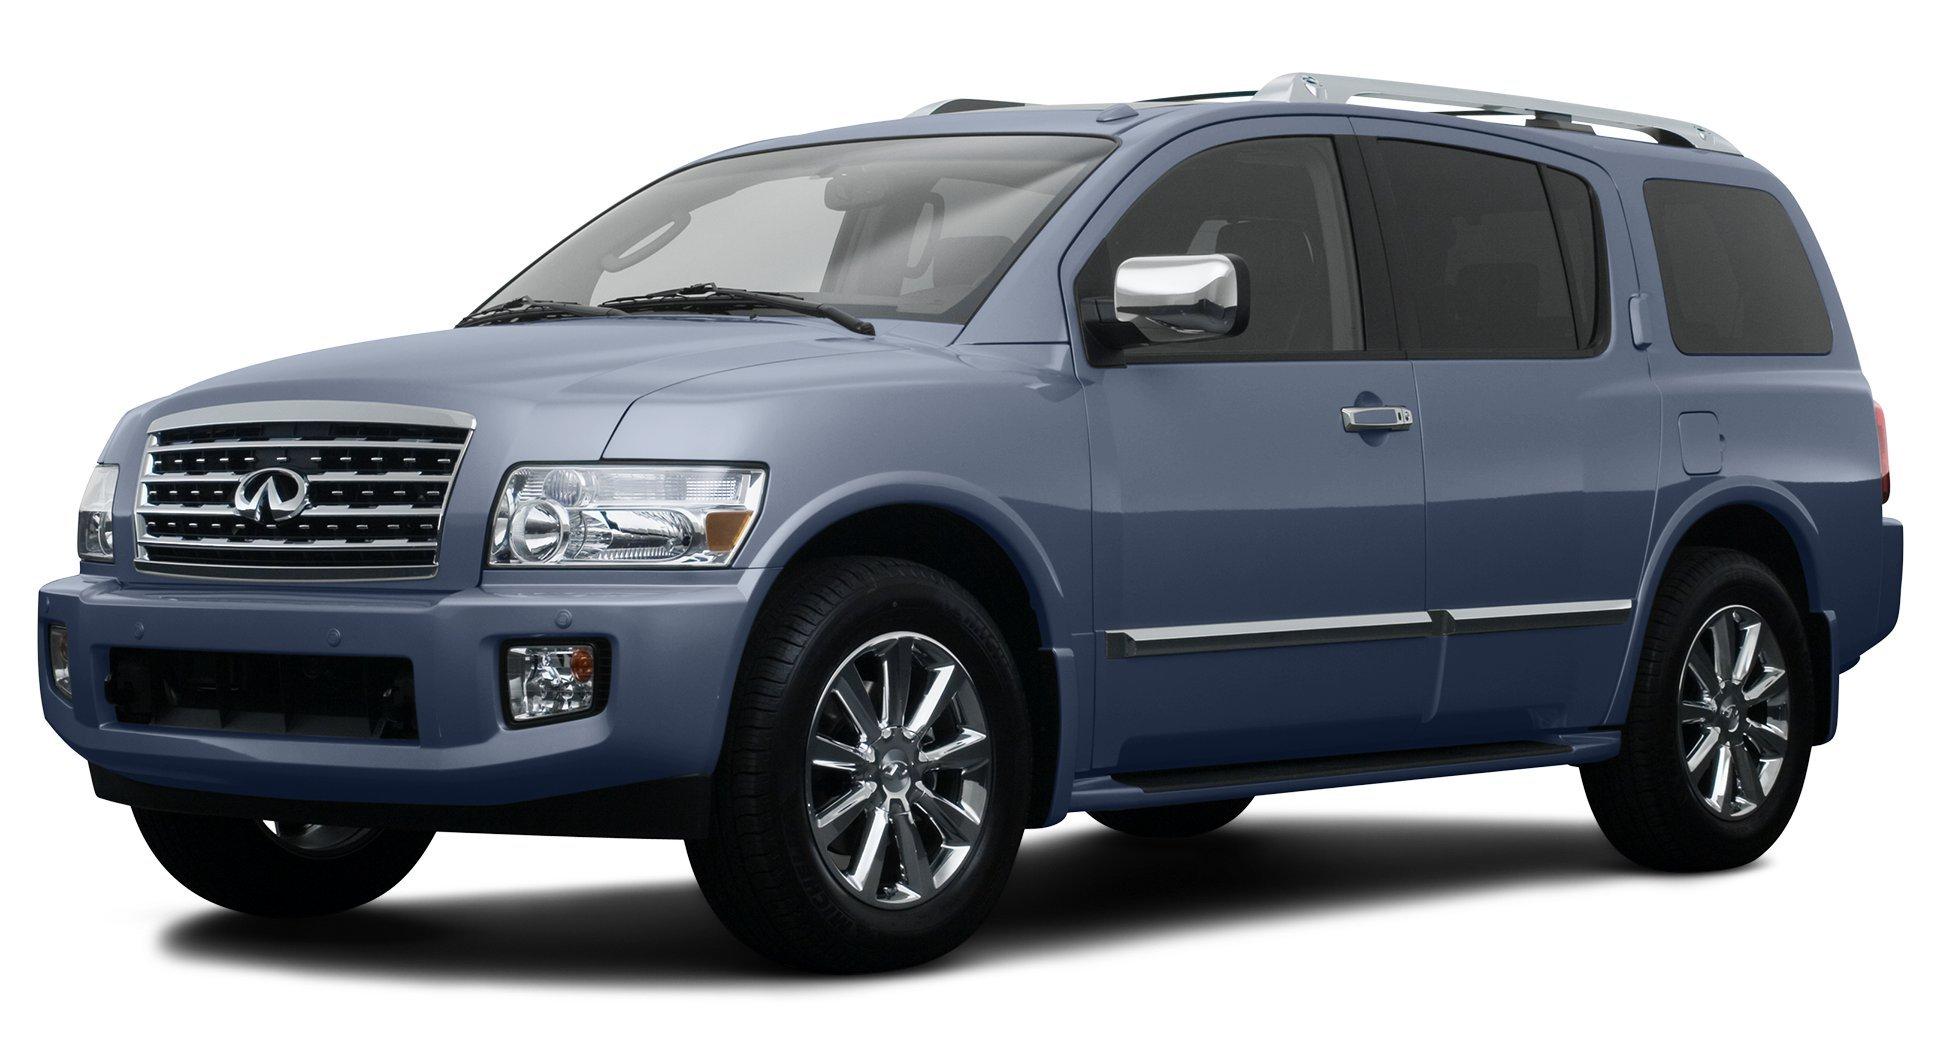 ... 2008 Infiniti QX56, Rear Wheel Drive 4-Door, 2008 Cadillac Escalade ...